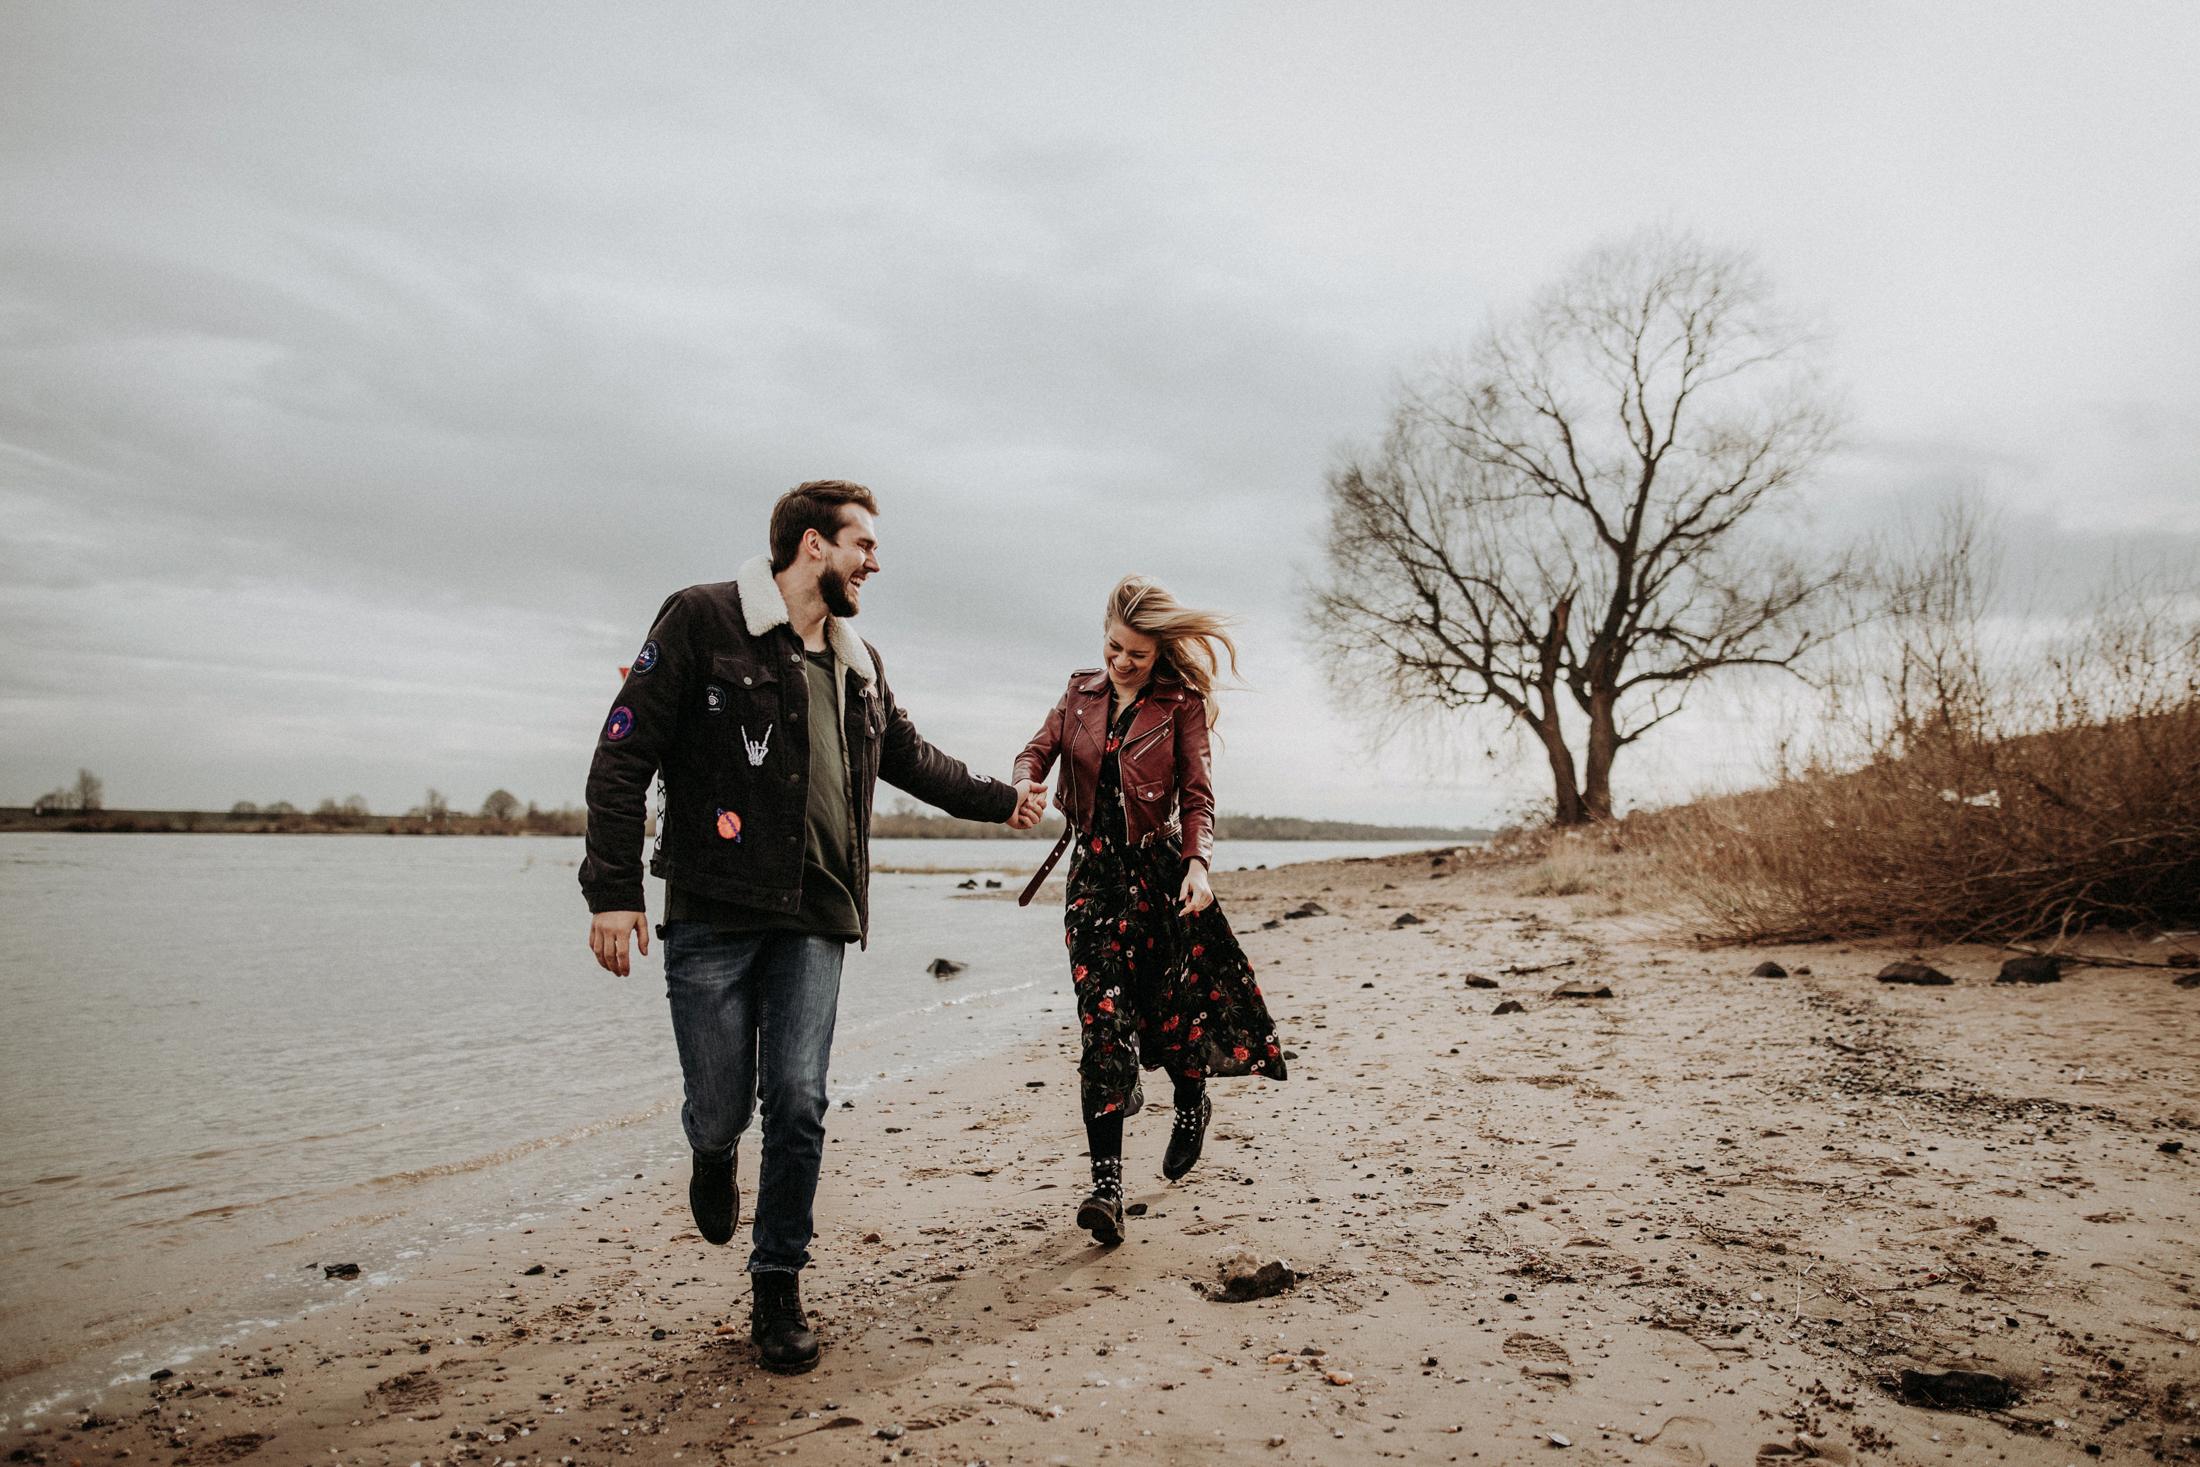 Wedding_Photographer_Mallorca_DanielaMarquardt_Photography_CanaryIslands_Lanzarote_Iceland_Tuscany_Santorini_Portugal_NewYork_Spain_Elopement_Hochzeitsfotograf_CK17